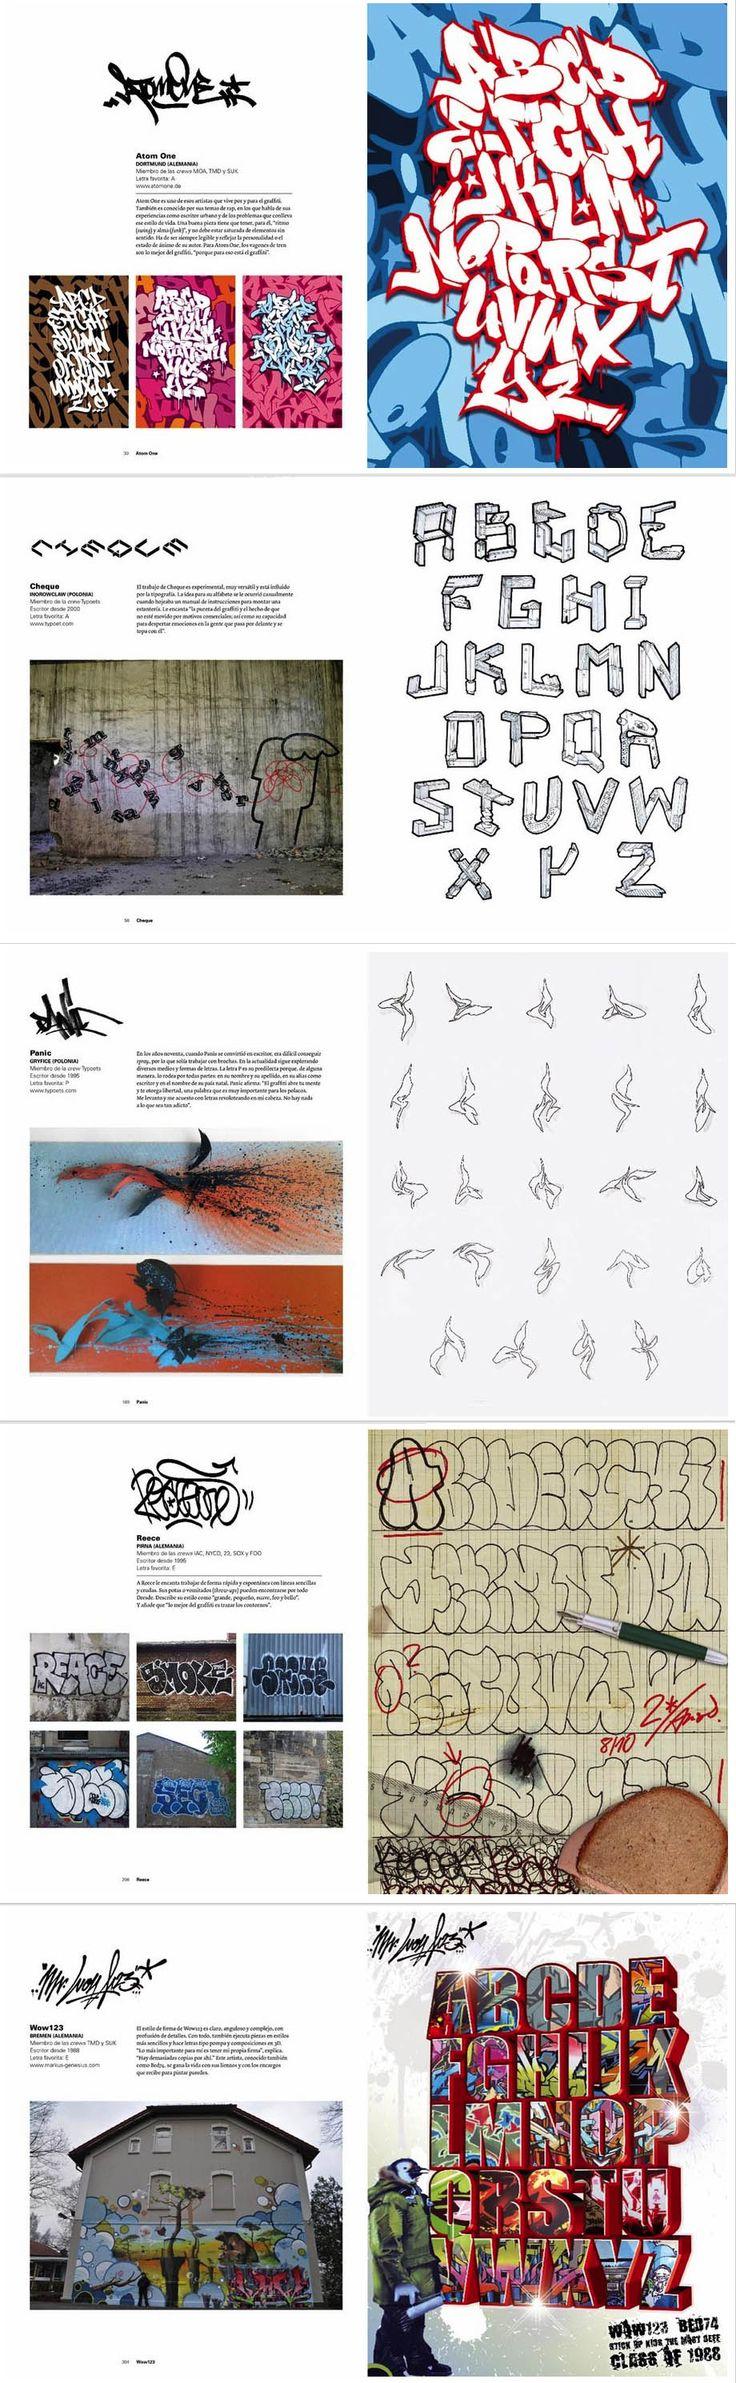 Alfabeto_graffiti_pages_collabcubed